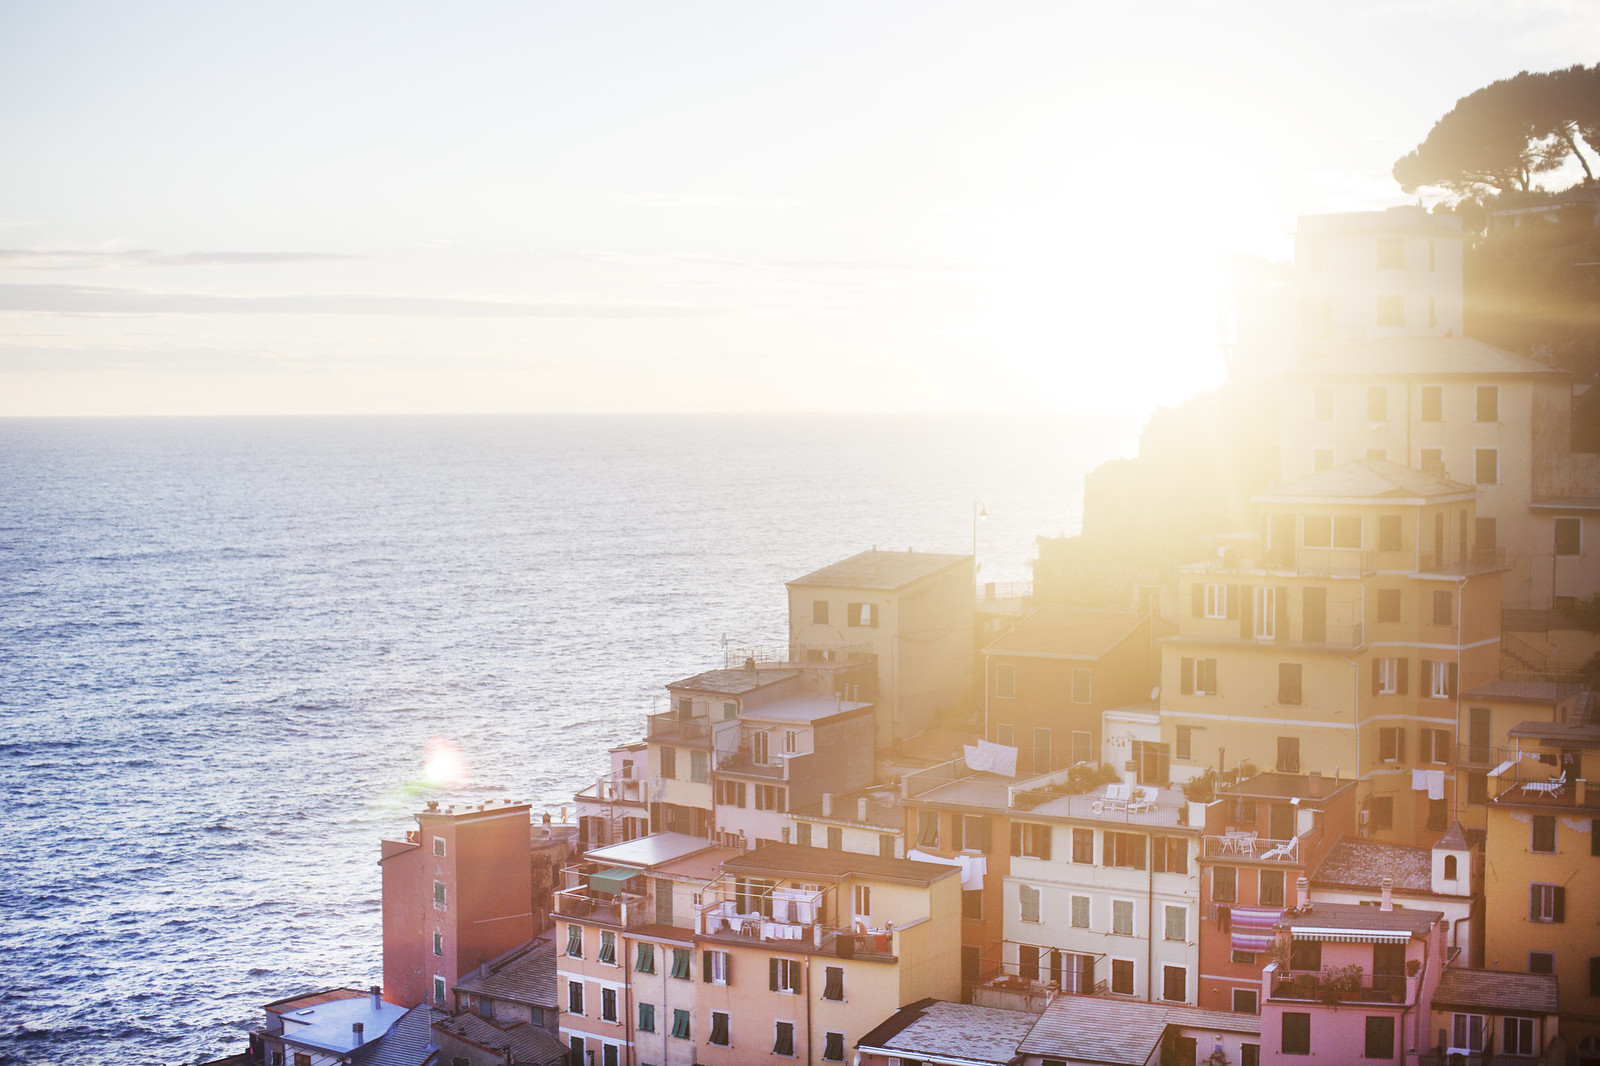 Riomaggiore, Cinque Terre, Italy at sunset